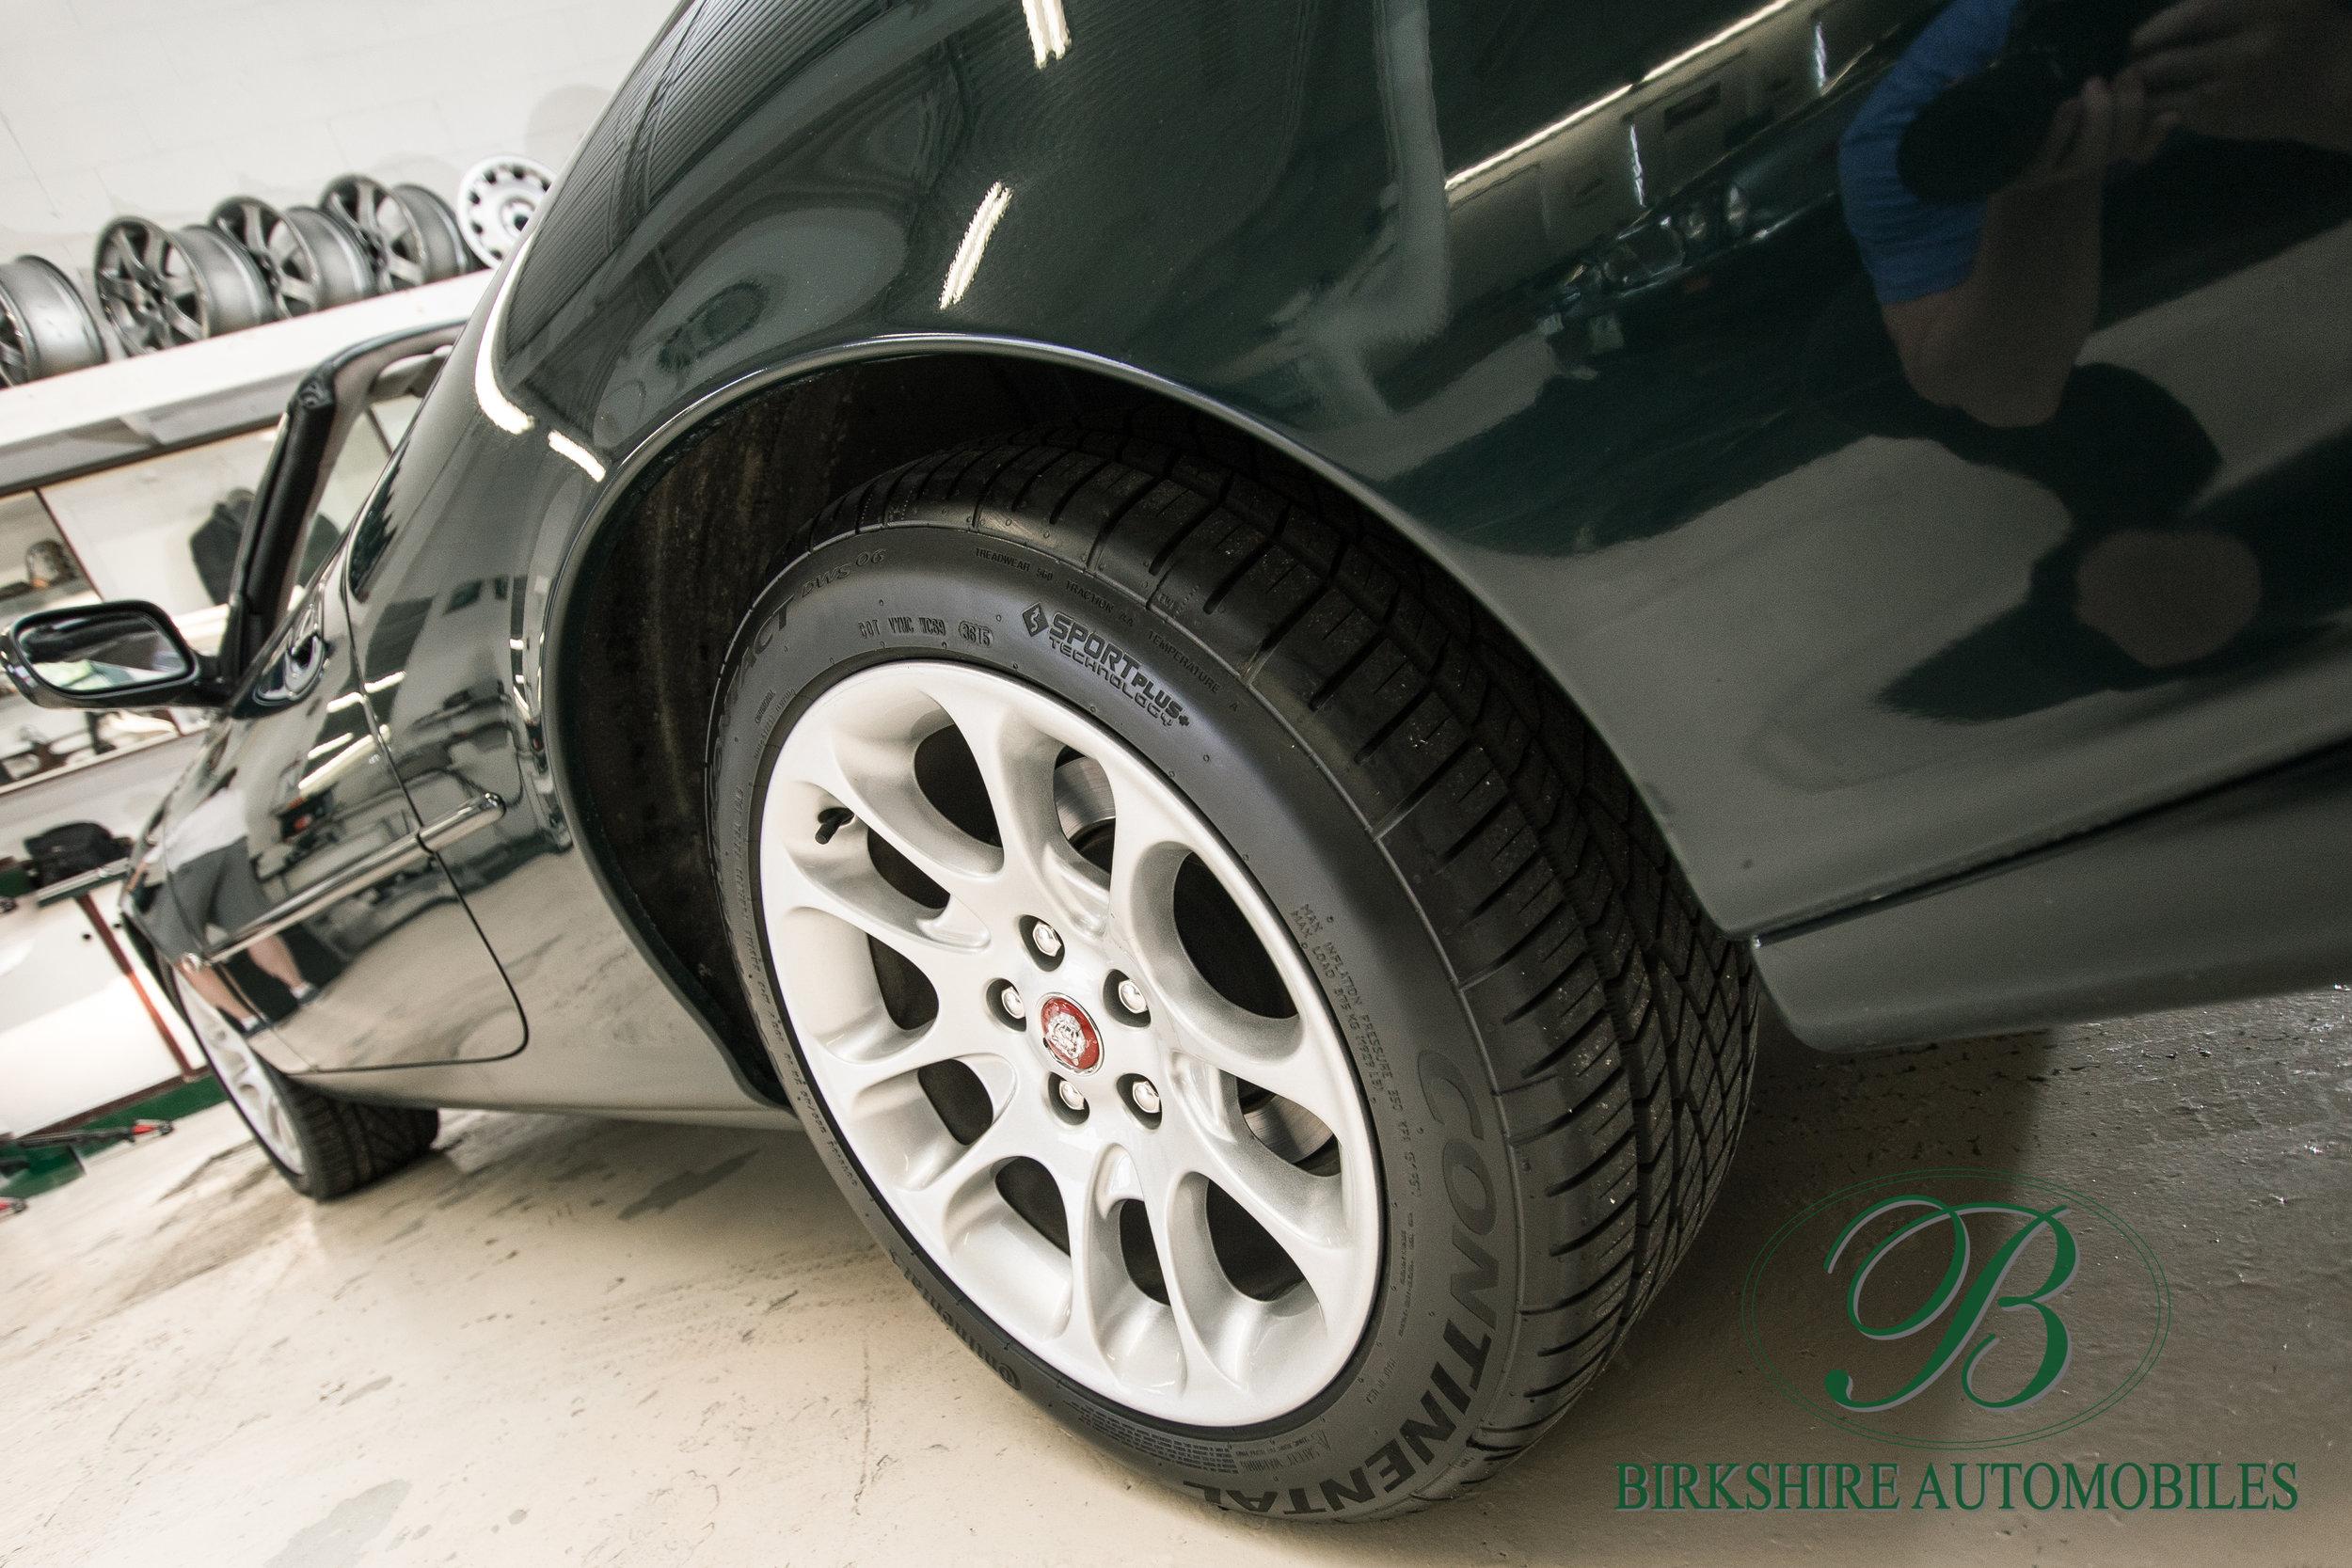 Birkshire Automobiles-141.jpg